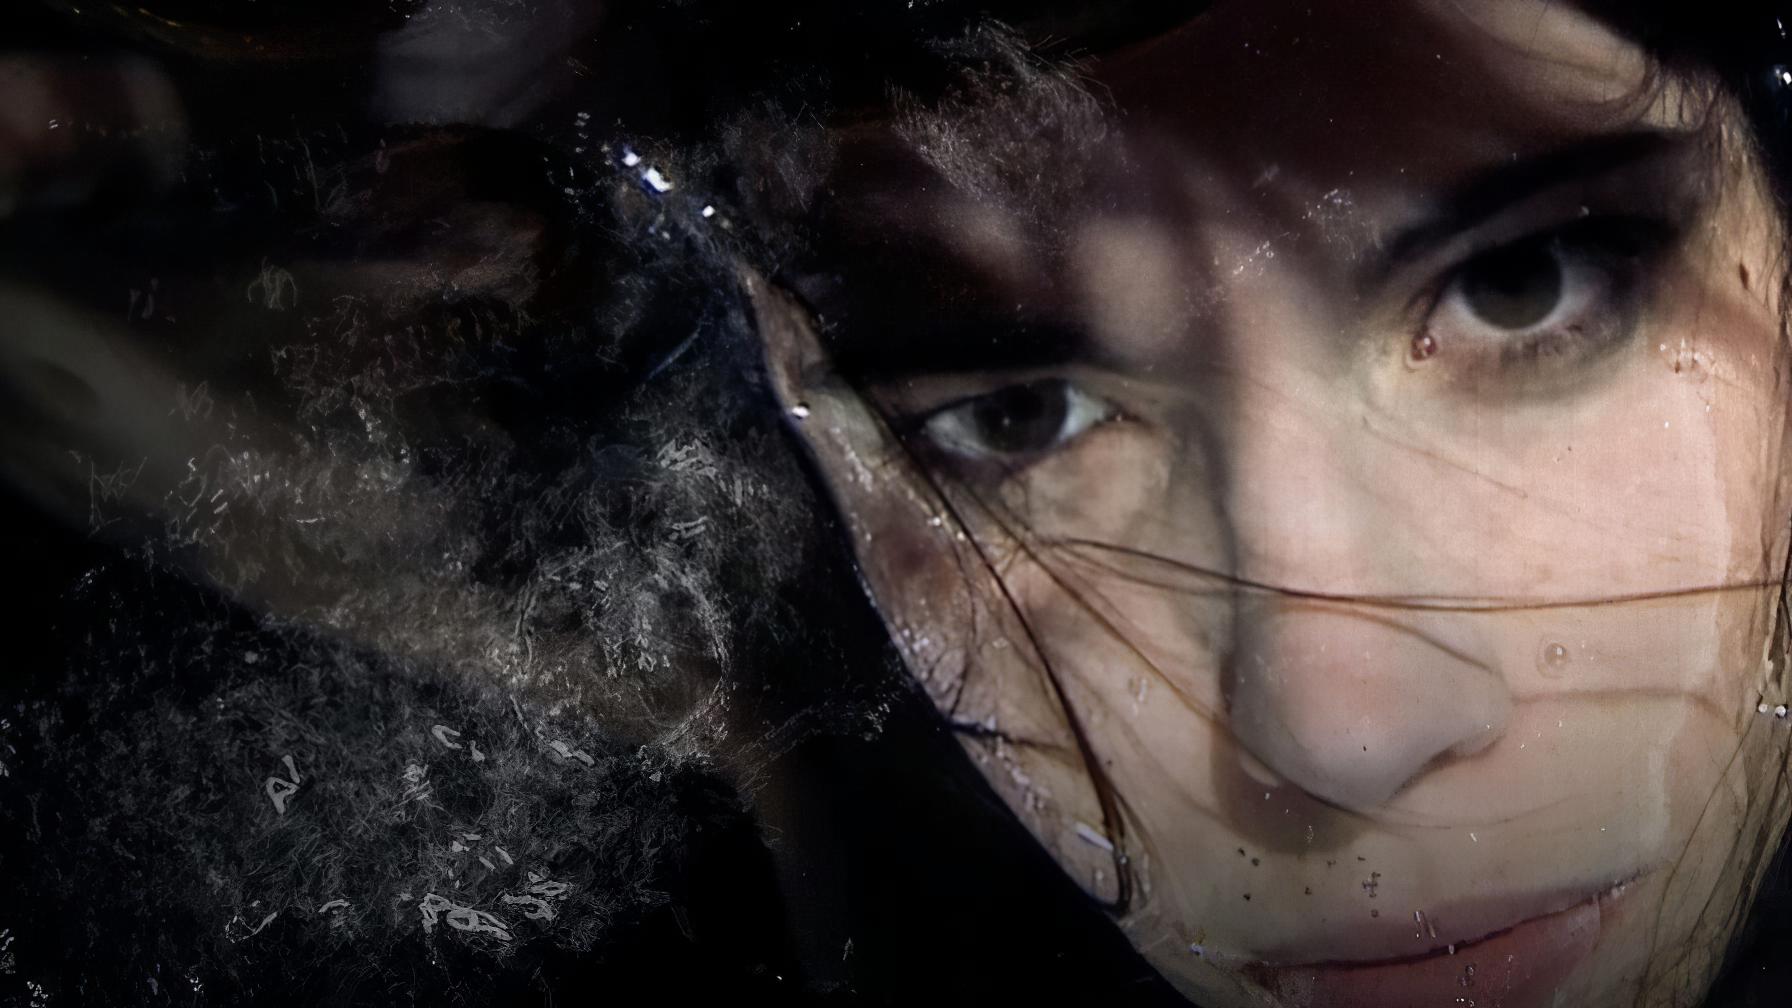 immersive-ltd_Knife-Party_live_music-videos_03-896×504-Gigapixel